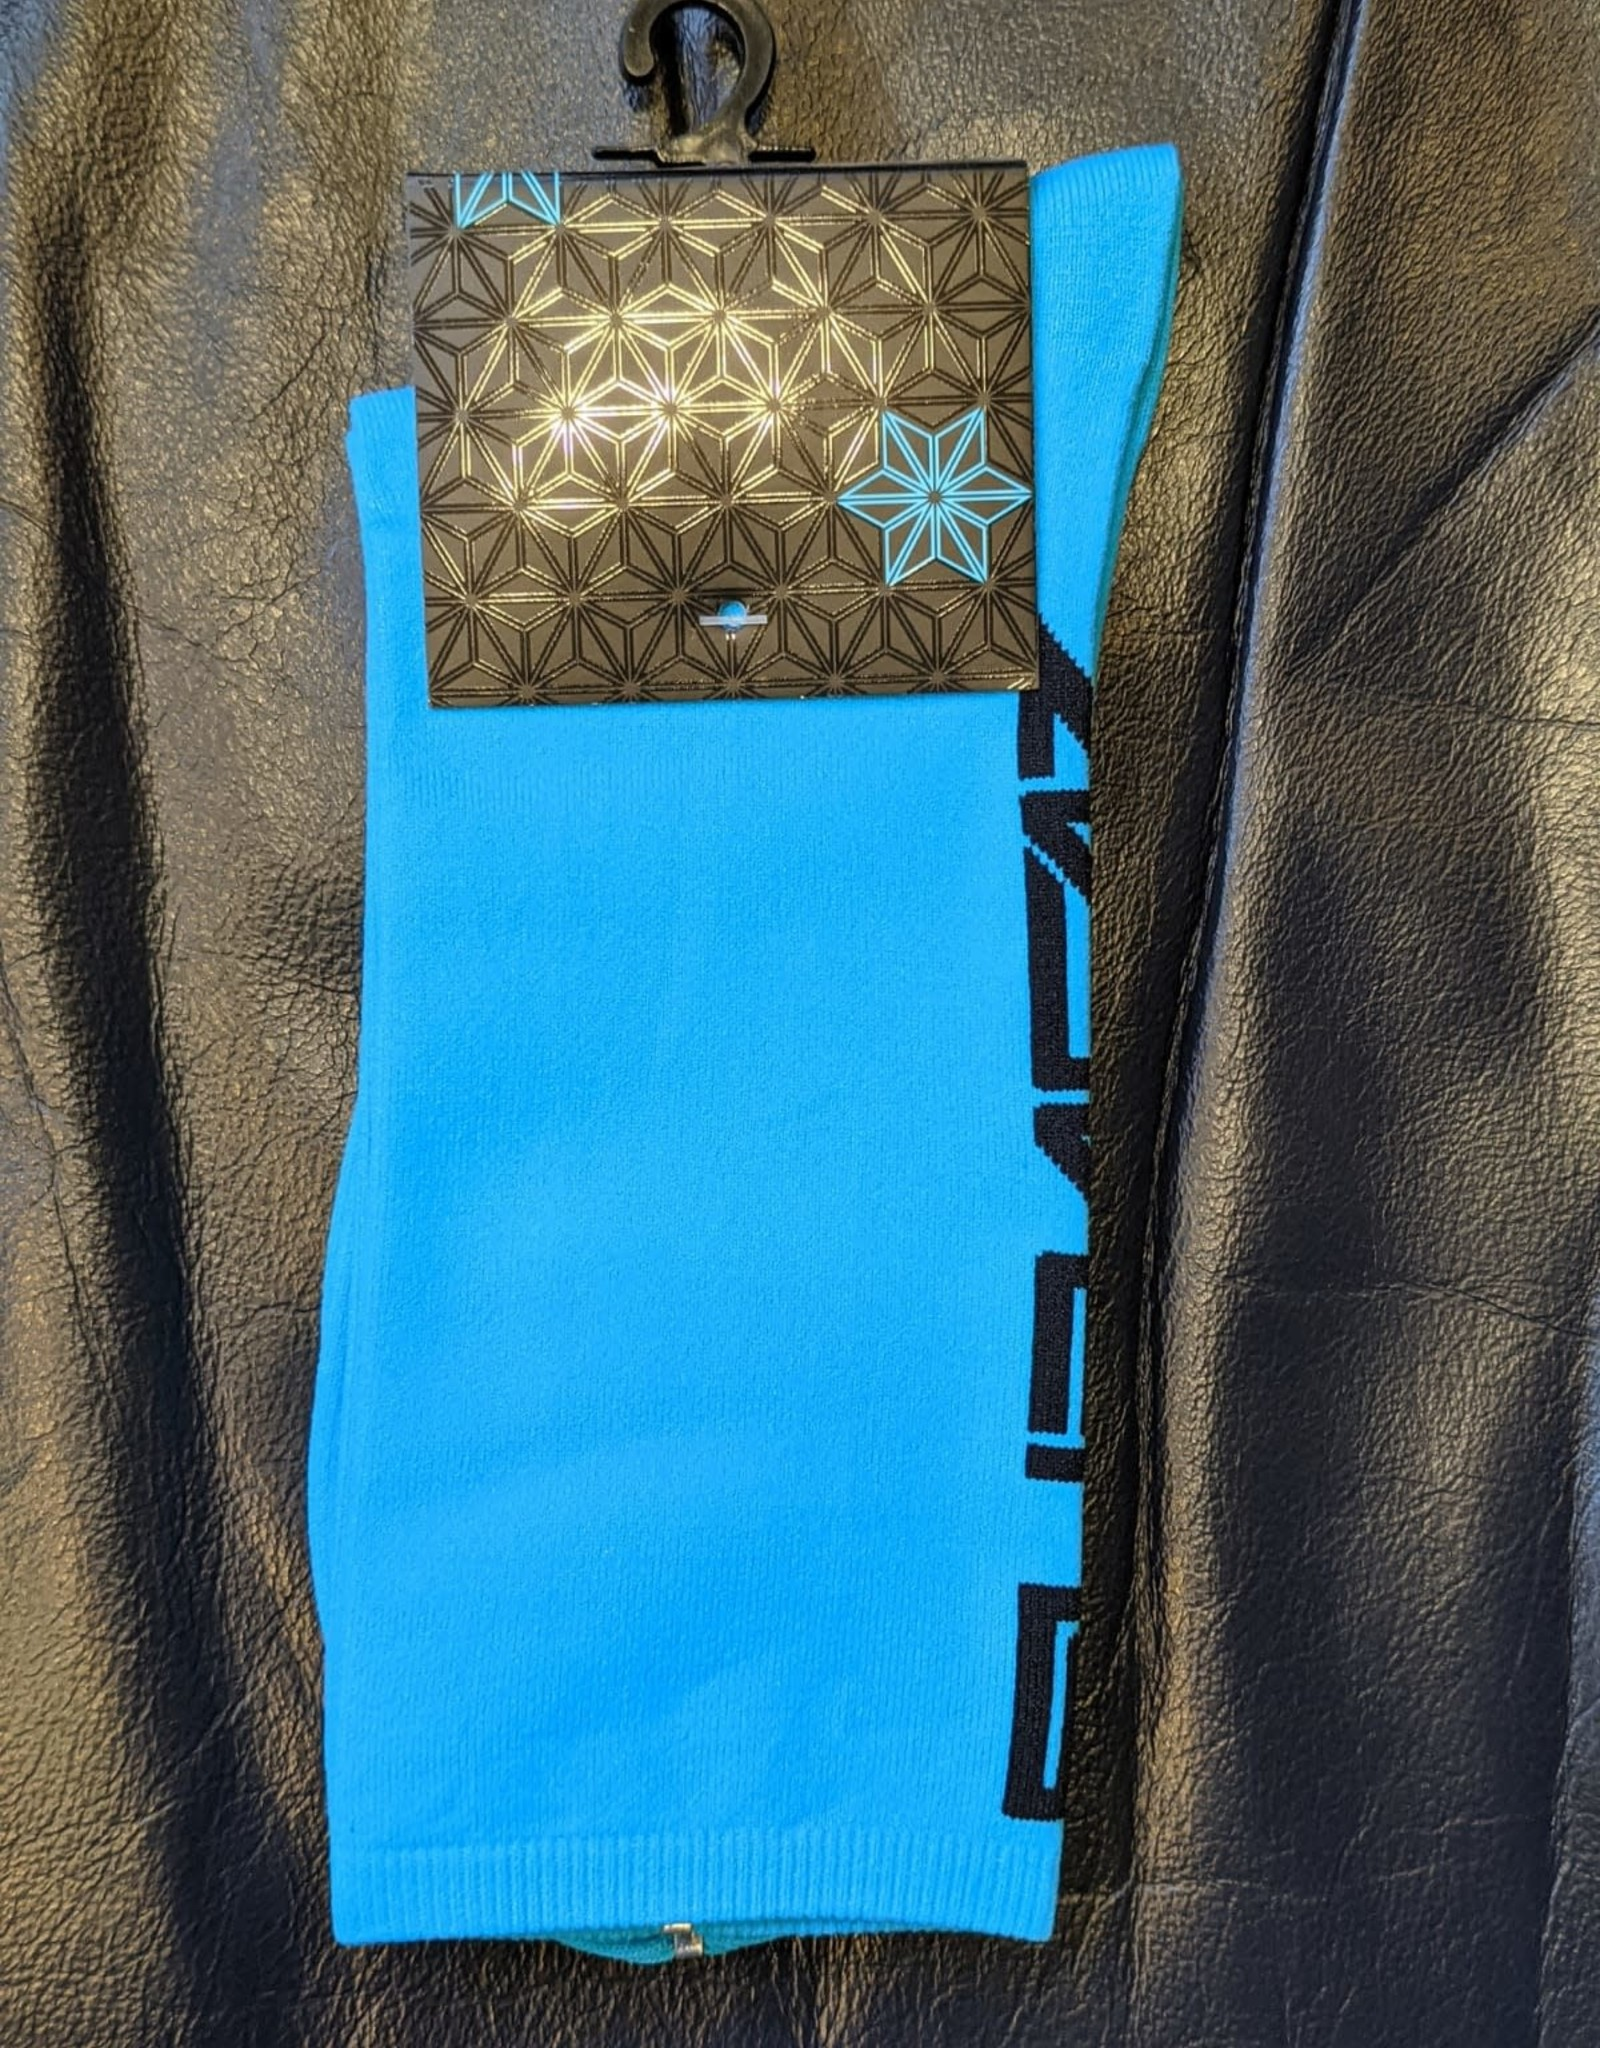 Supacaz SupaSox Straight Up SL Socks, Neon Blue (with Black), Small/Medium